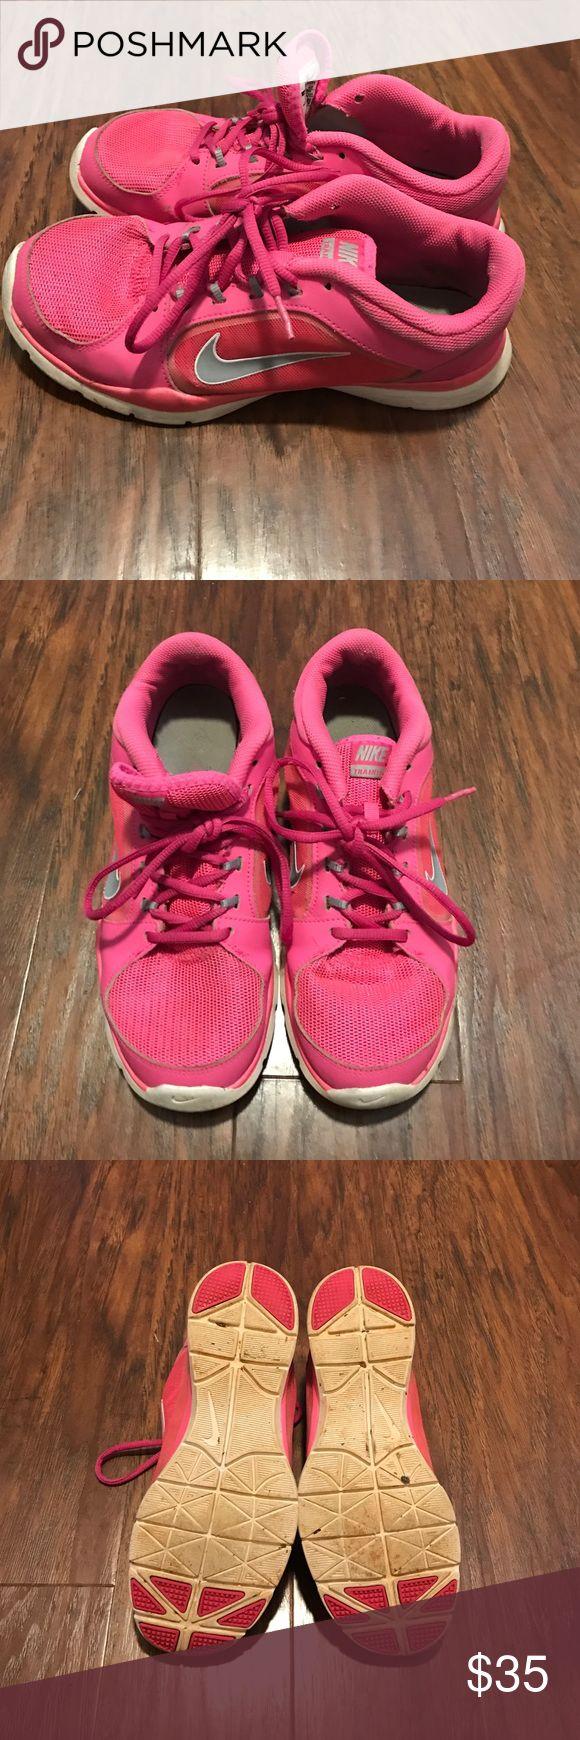 Hot pink Nike Hot pink Nike tennis shoes Nike Shoes